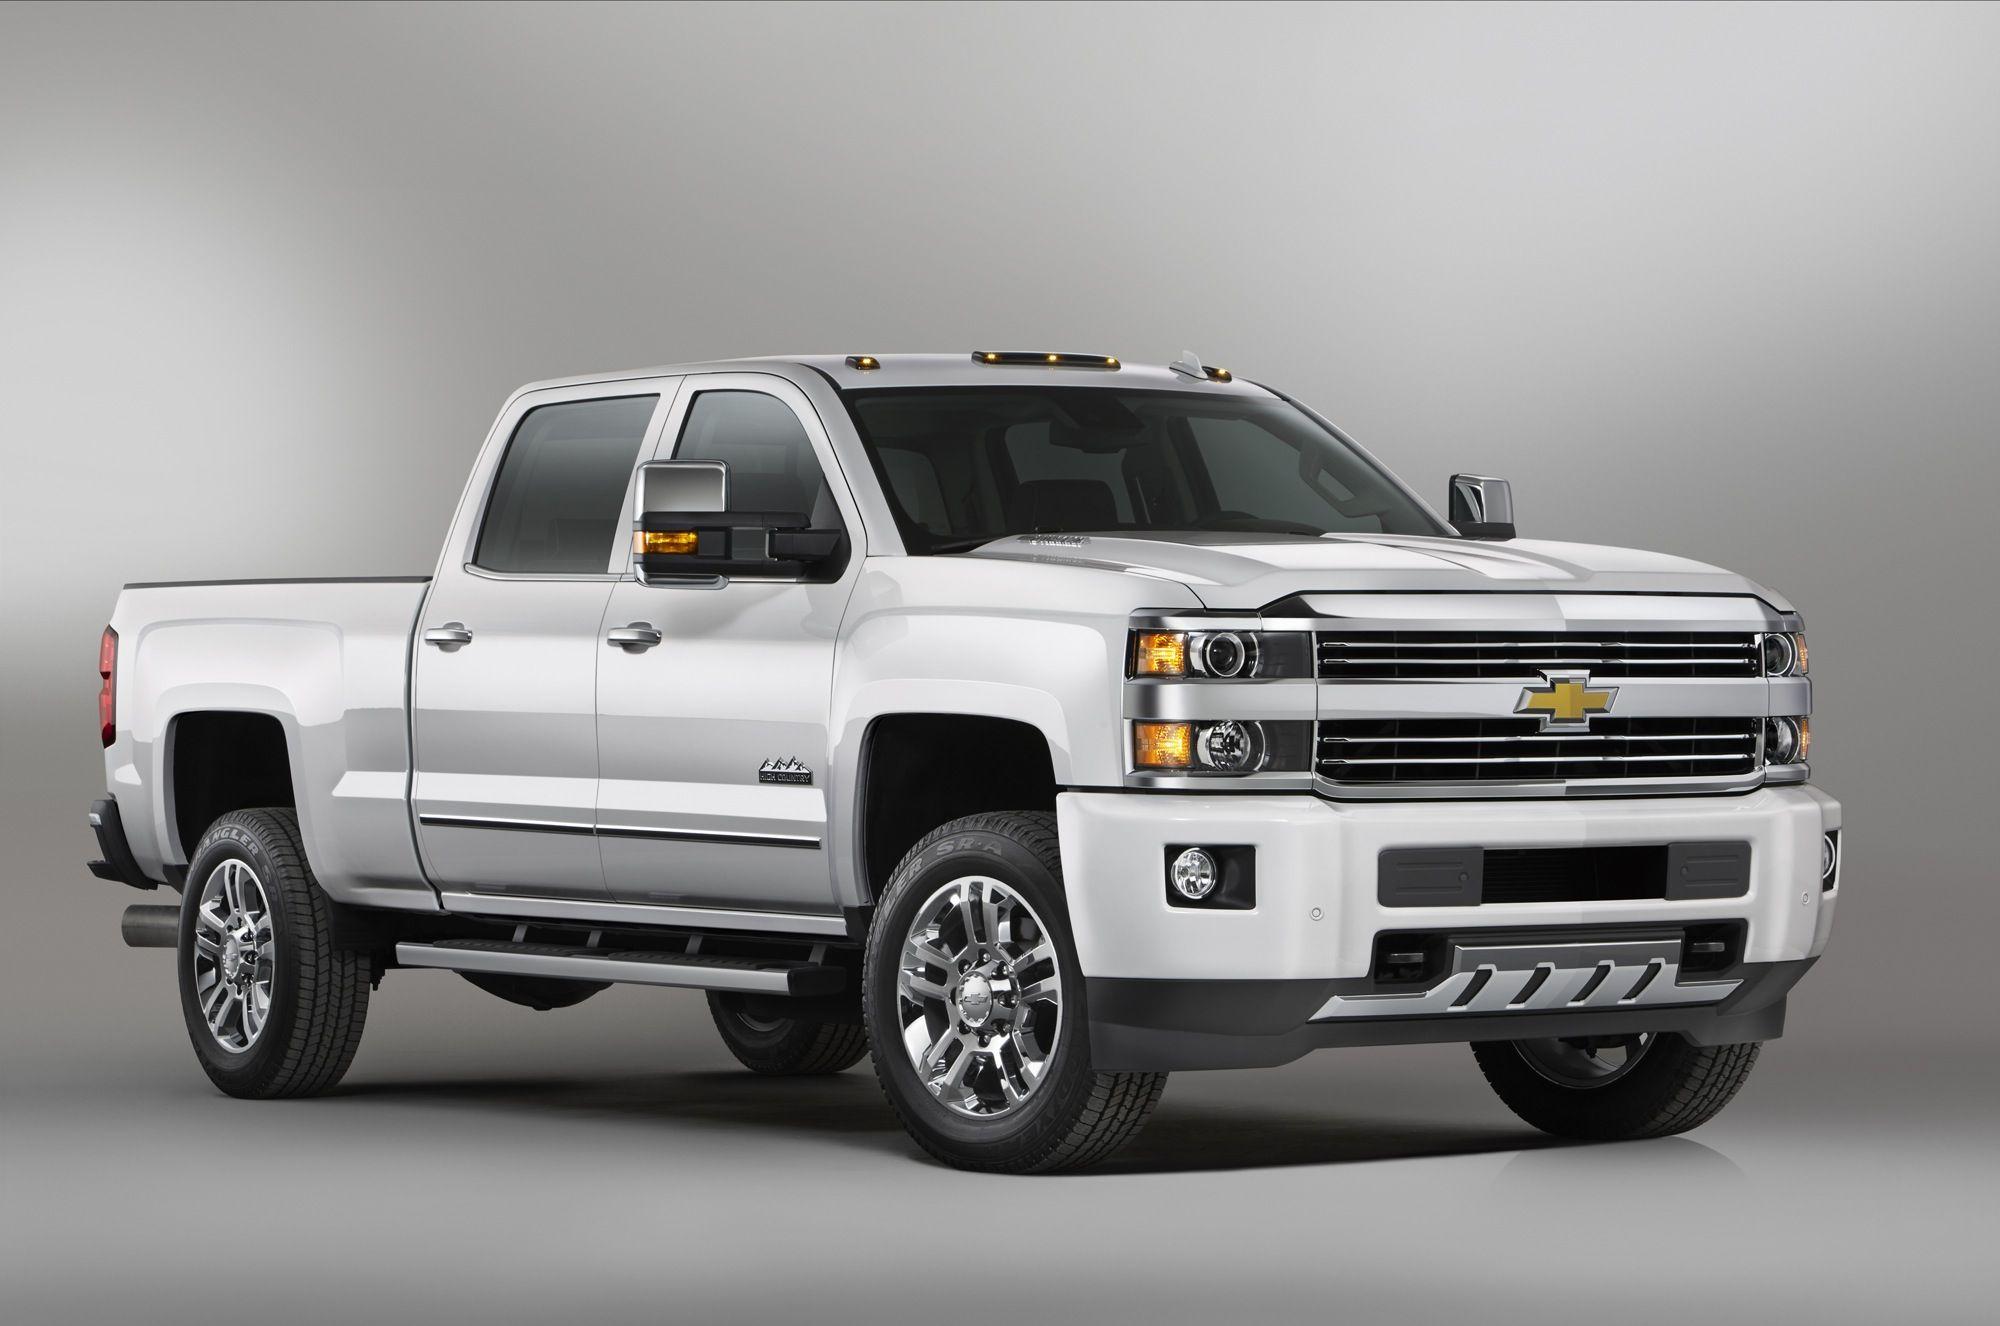 2017 Chevrolet Silverado 2500 Hd High Country Gm Authority